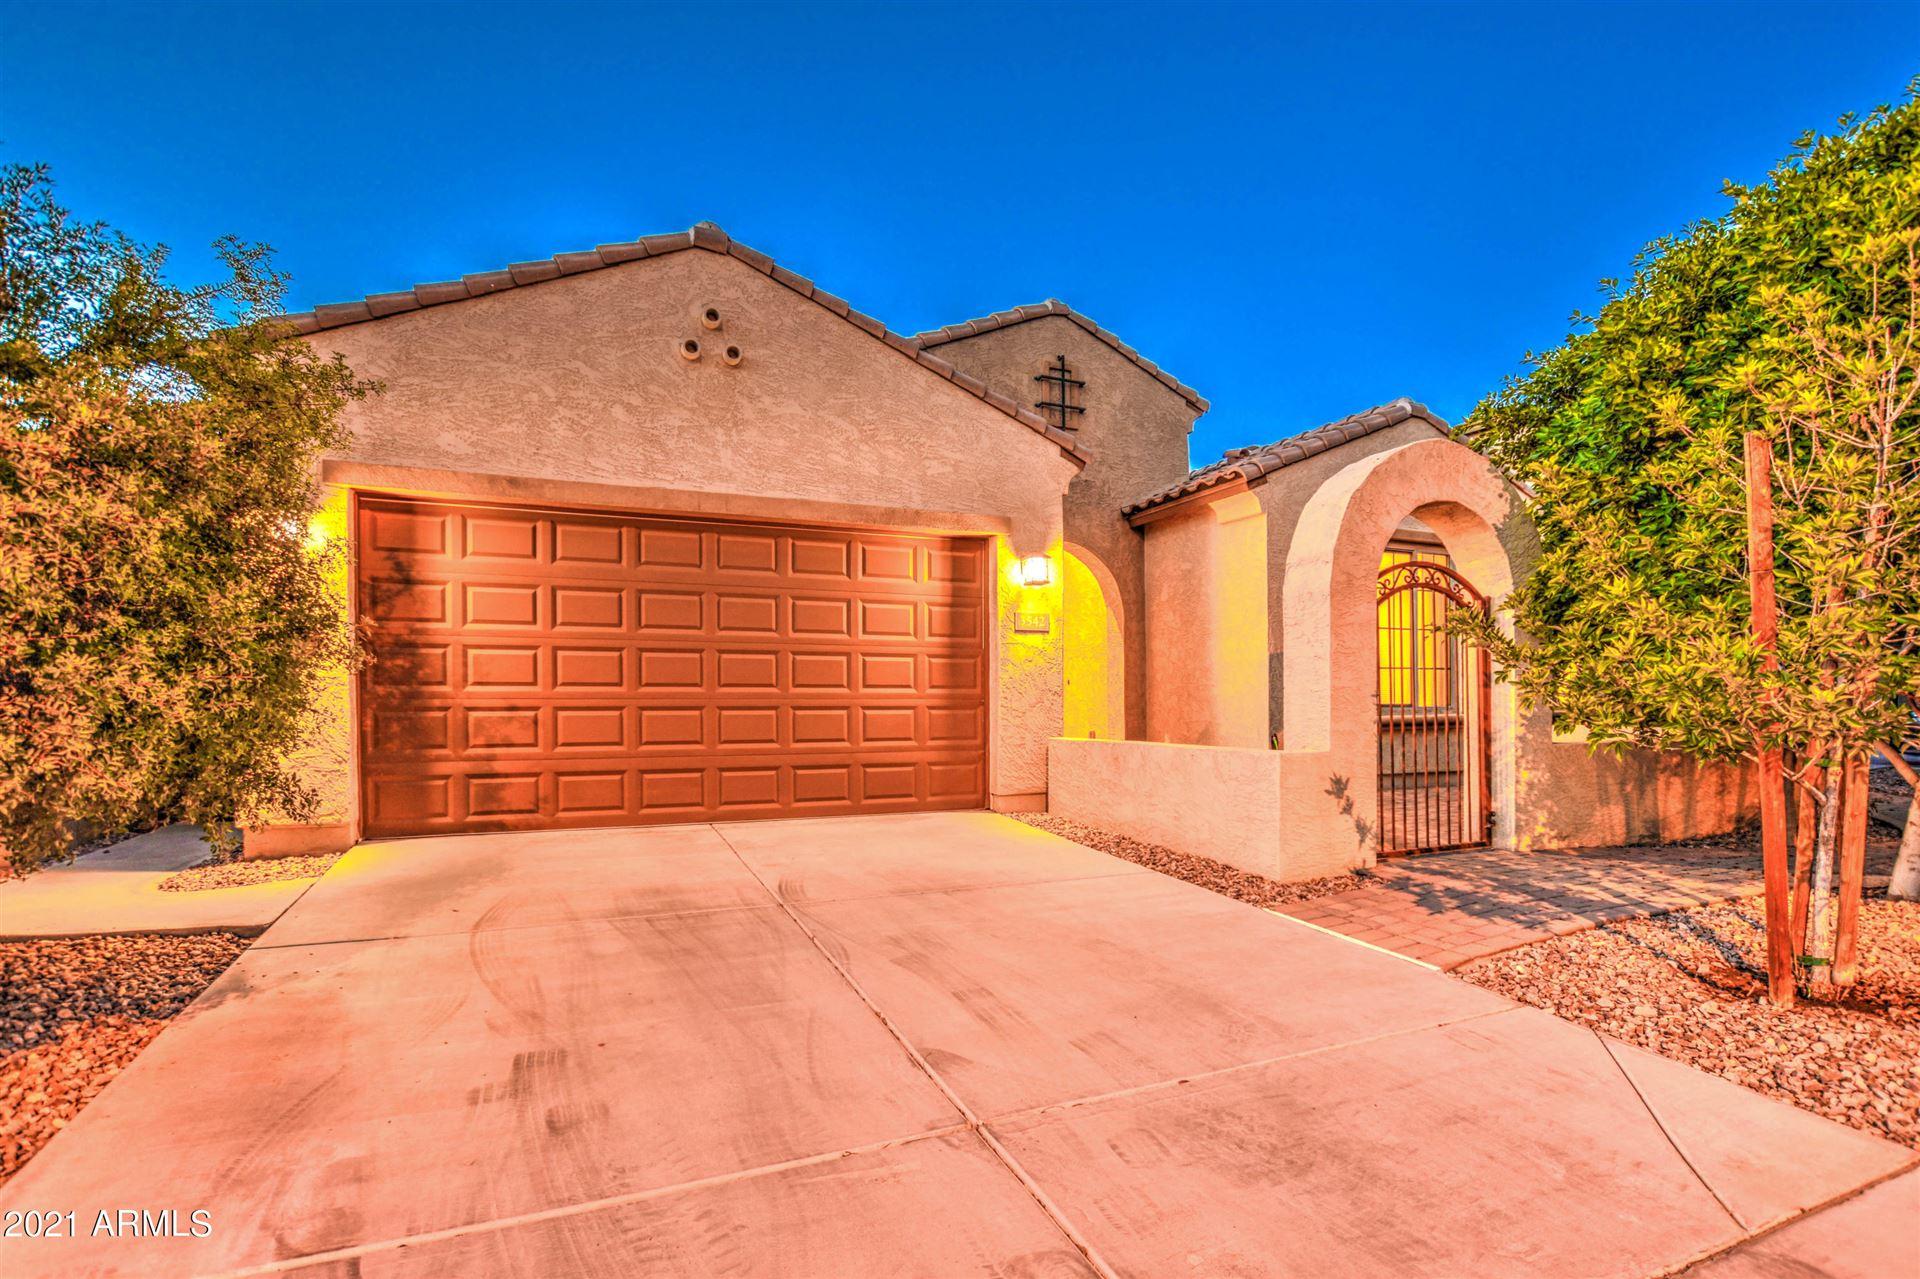 Photo of 3542 E MEGAN Street, Gilbert, AZ 85295 (MLS # 6232137)